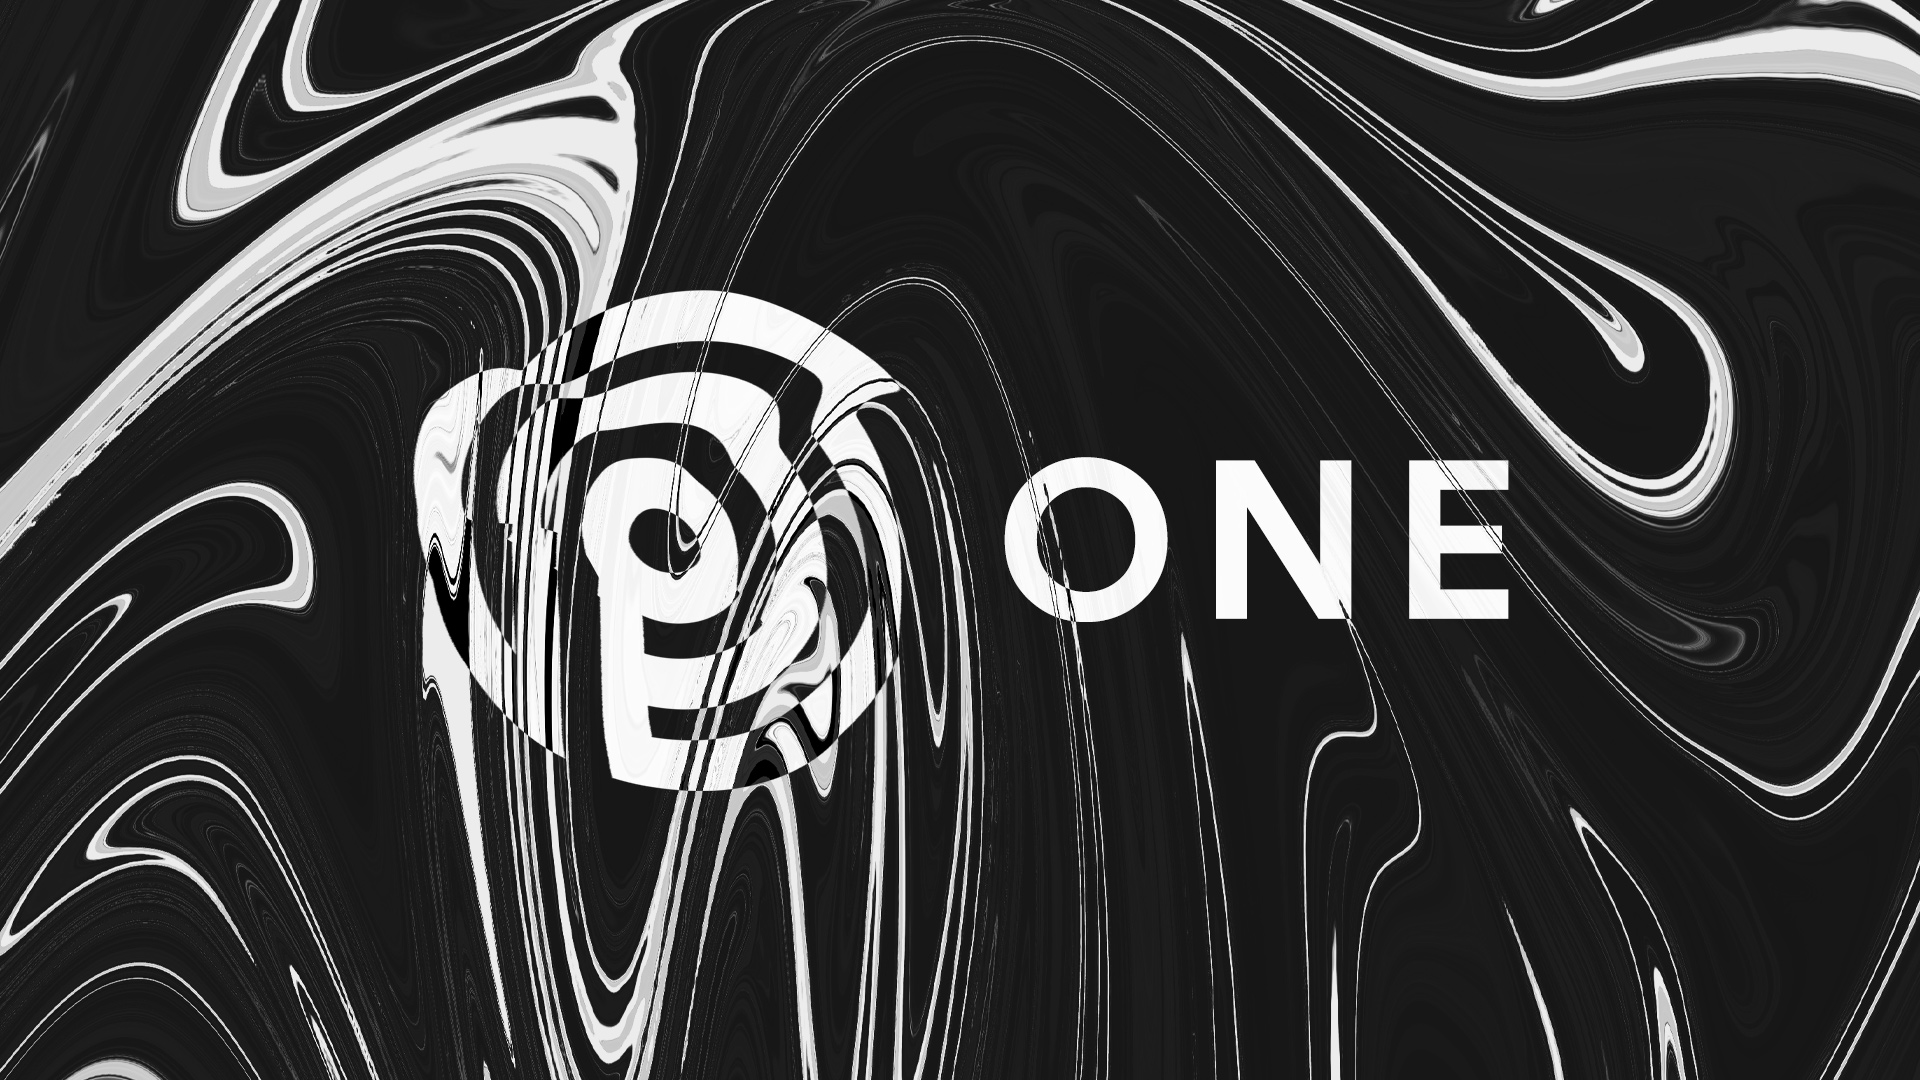 Polychroma: One